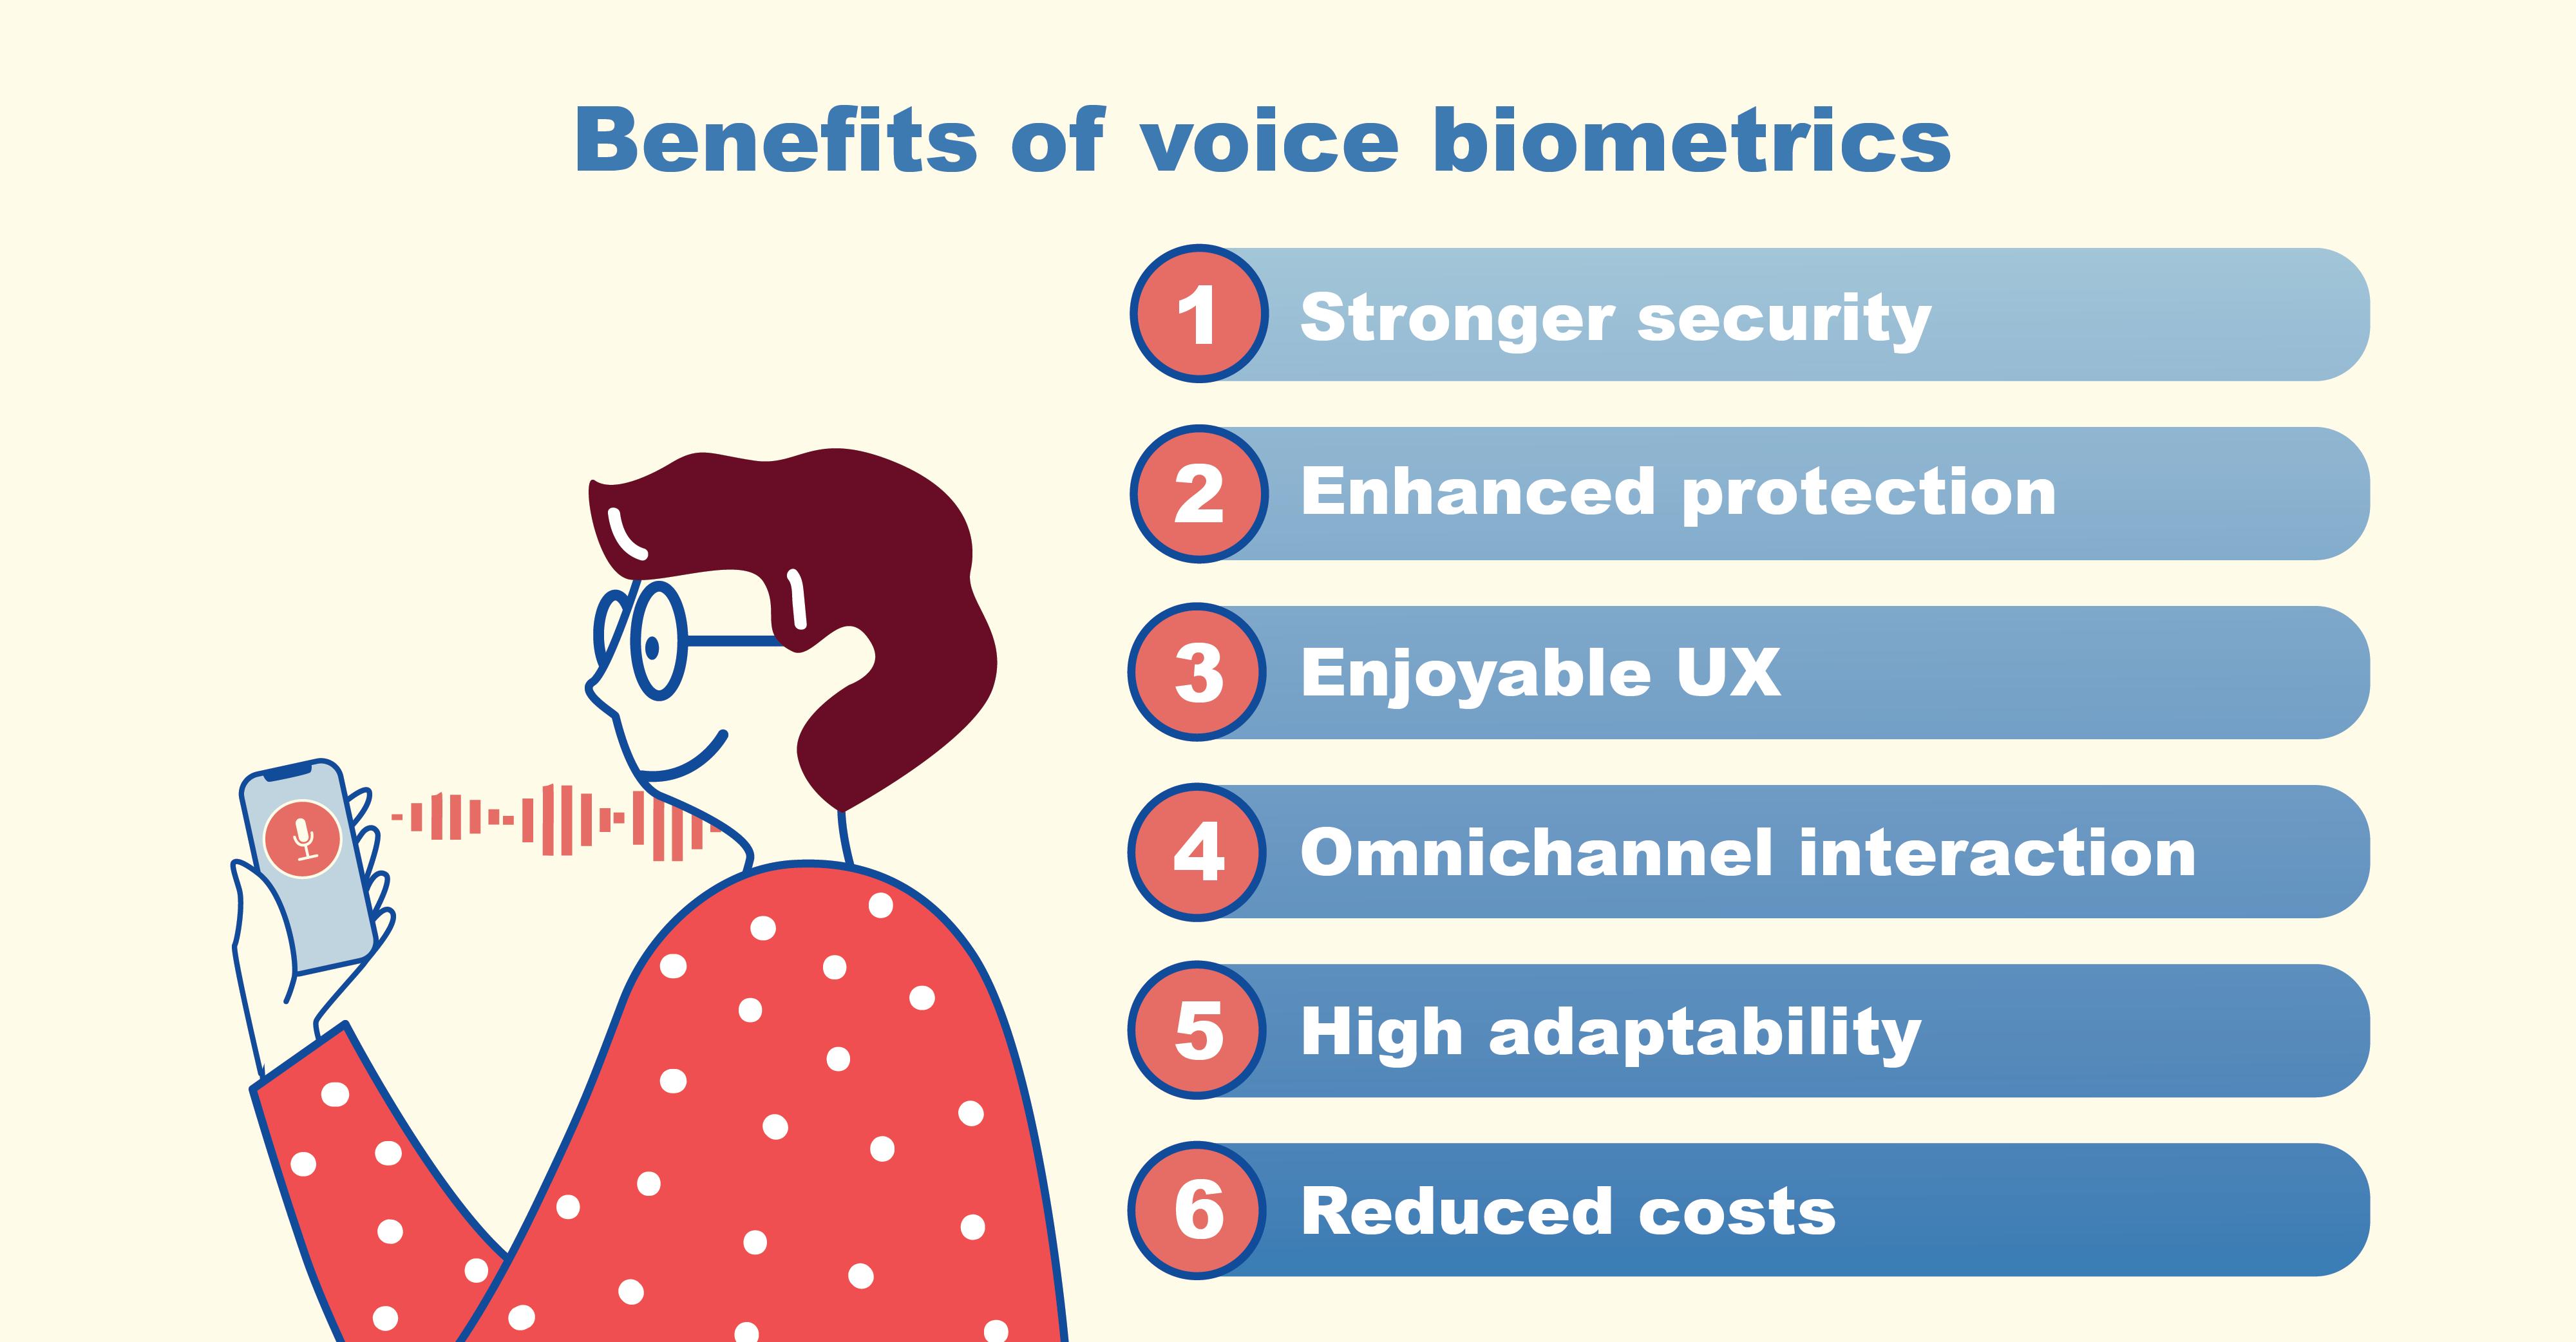 Benefits of using voice biometrics